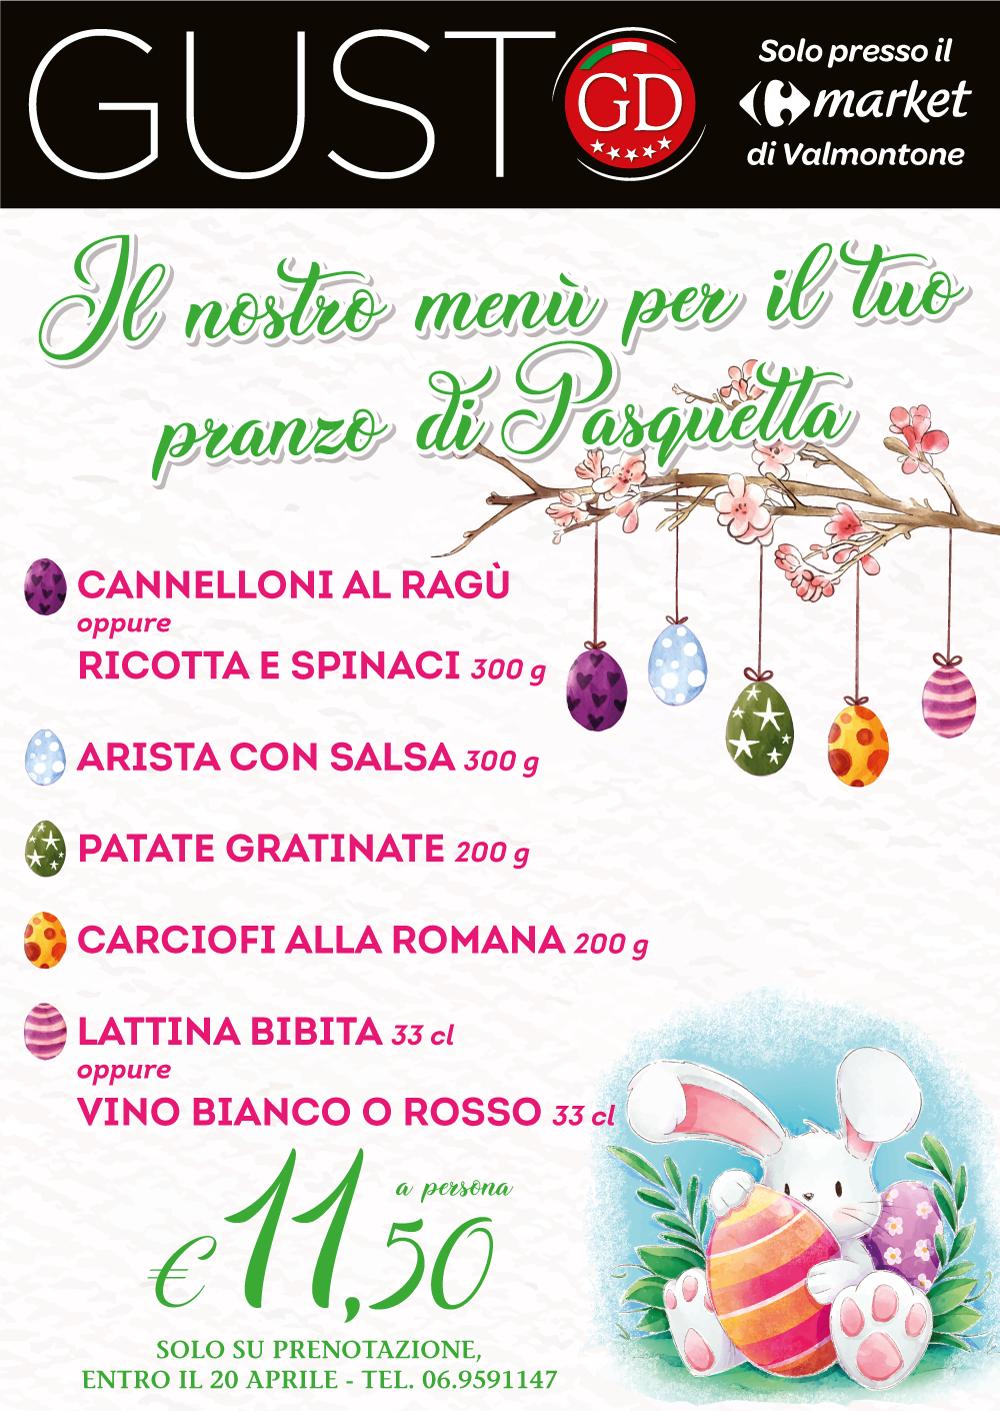 gusto-gd_valmontone_tavola-calda-pinseria-pasquetta